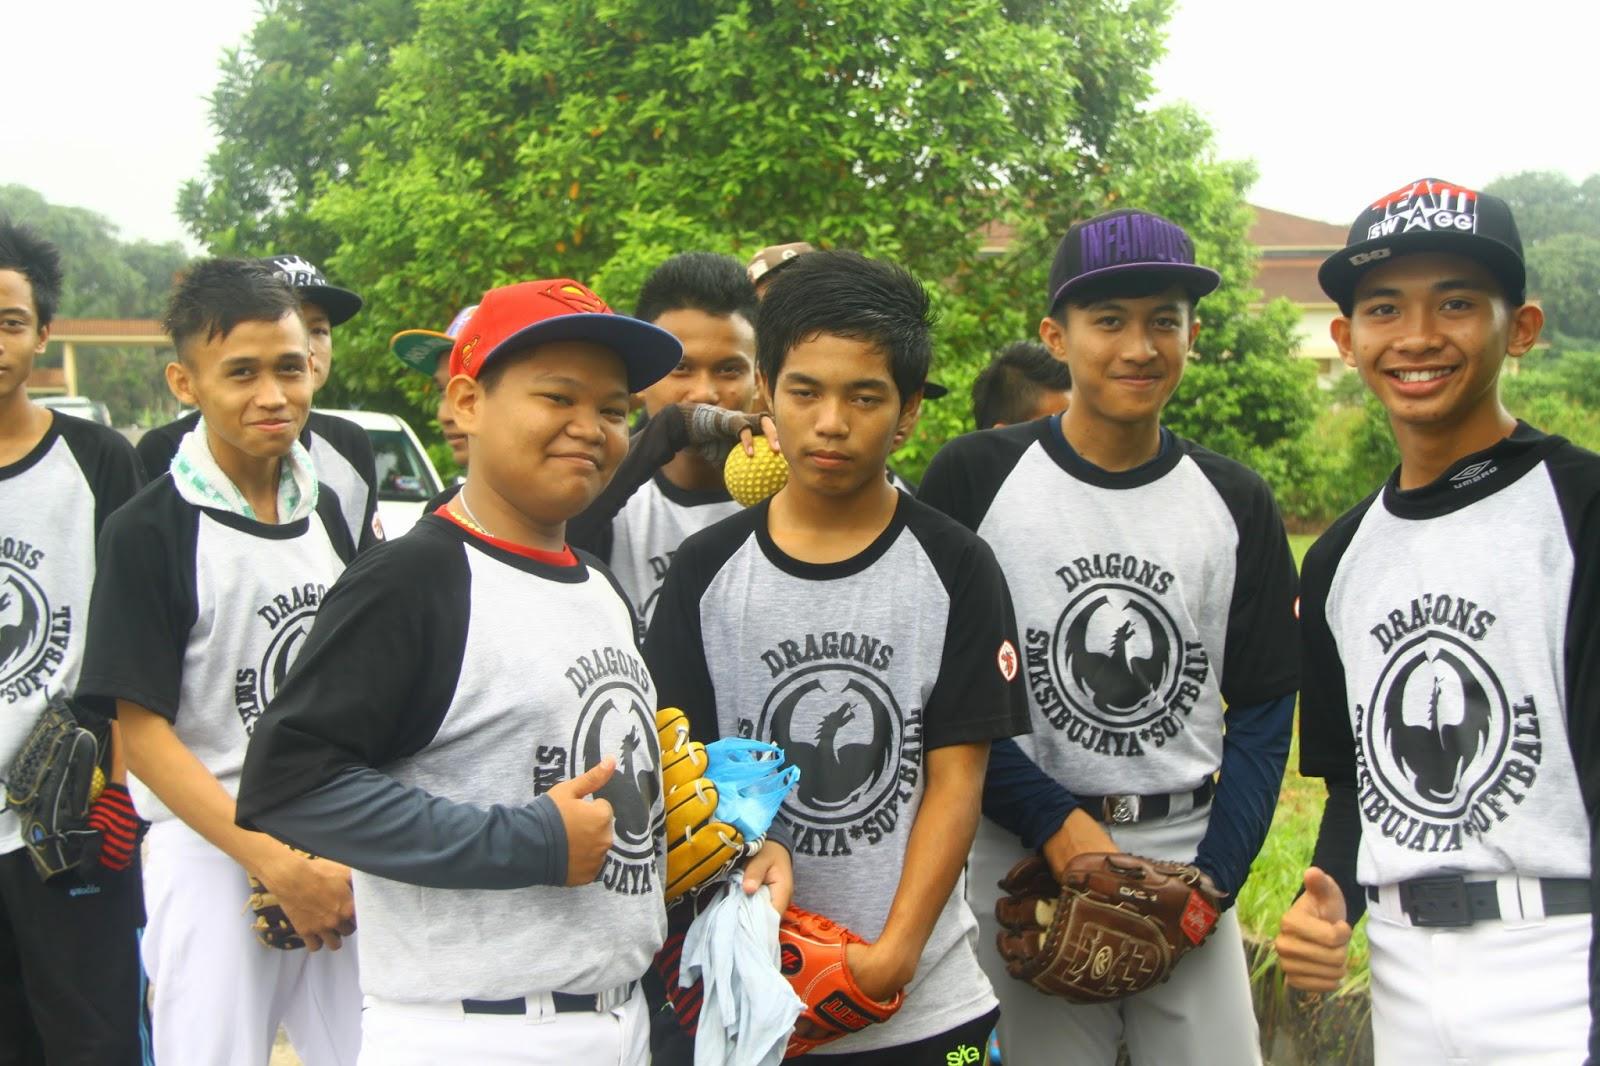 Kejohanan Sofbol MSS Sibu 2014 : Johan Berganda!